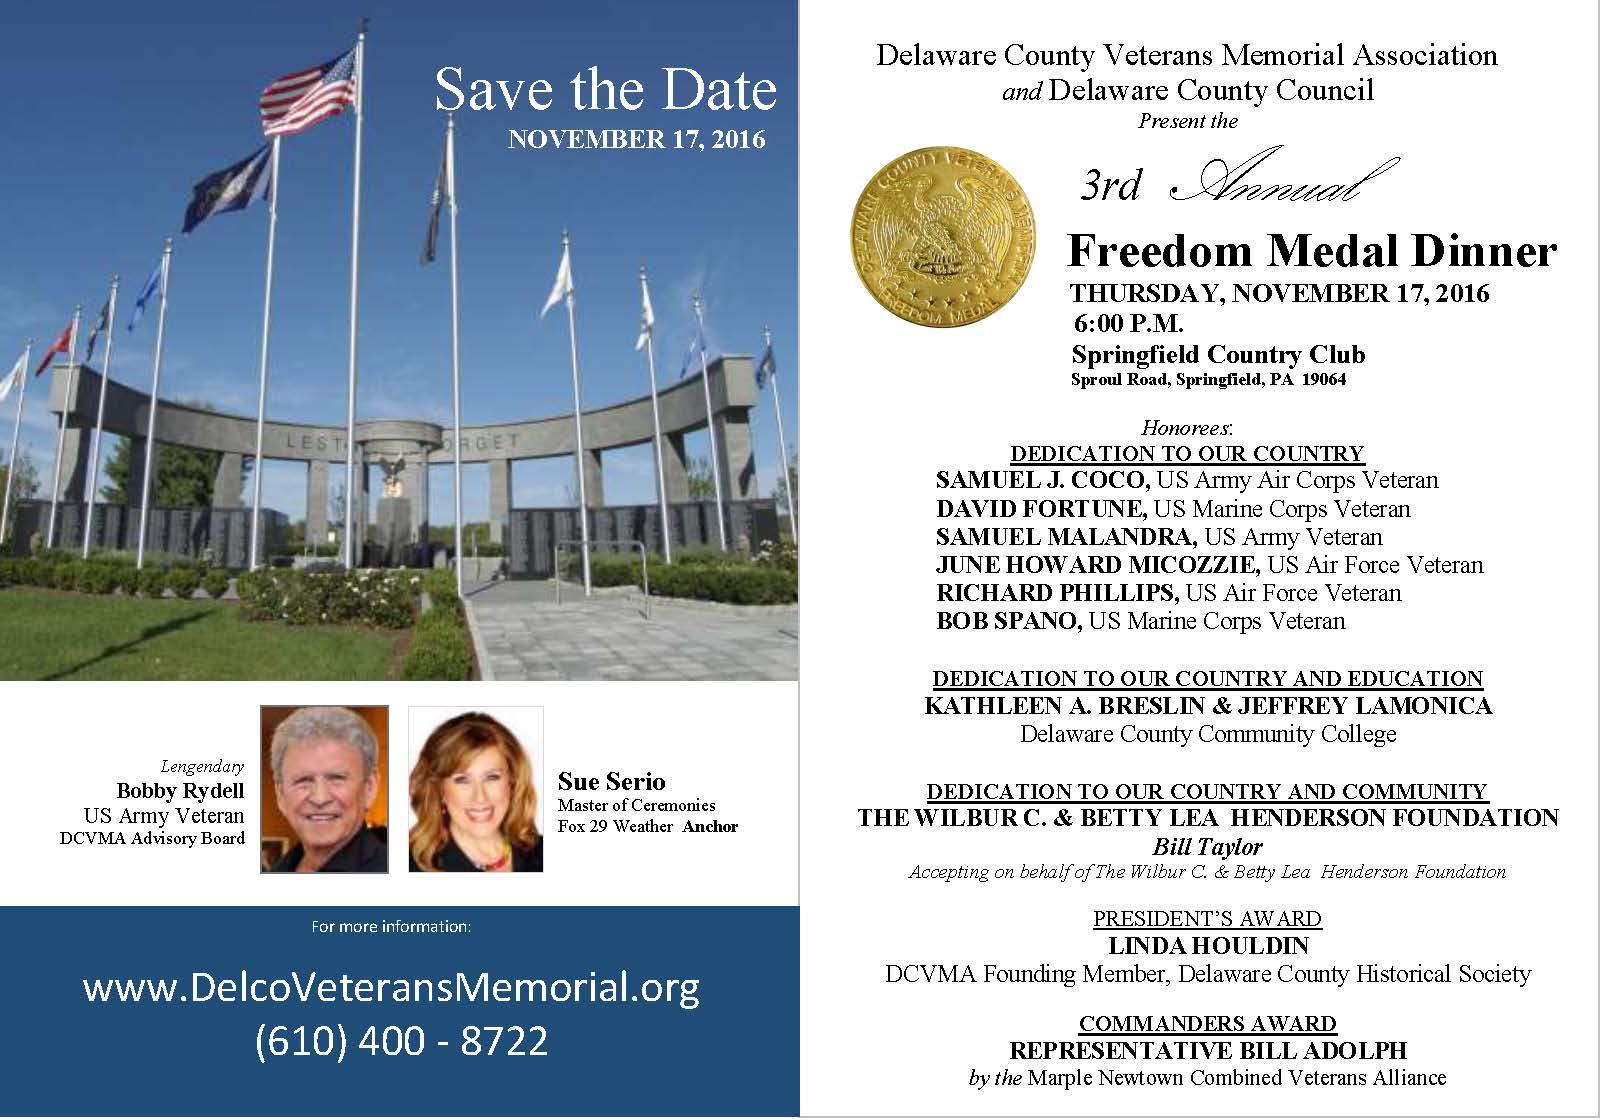 3rd Annual Freedom Medal Dinner